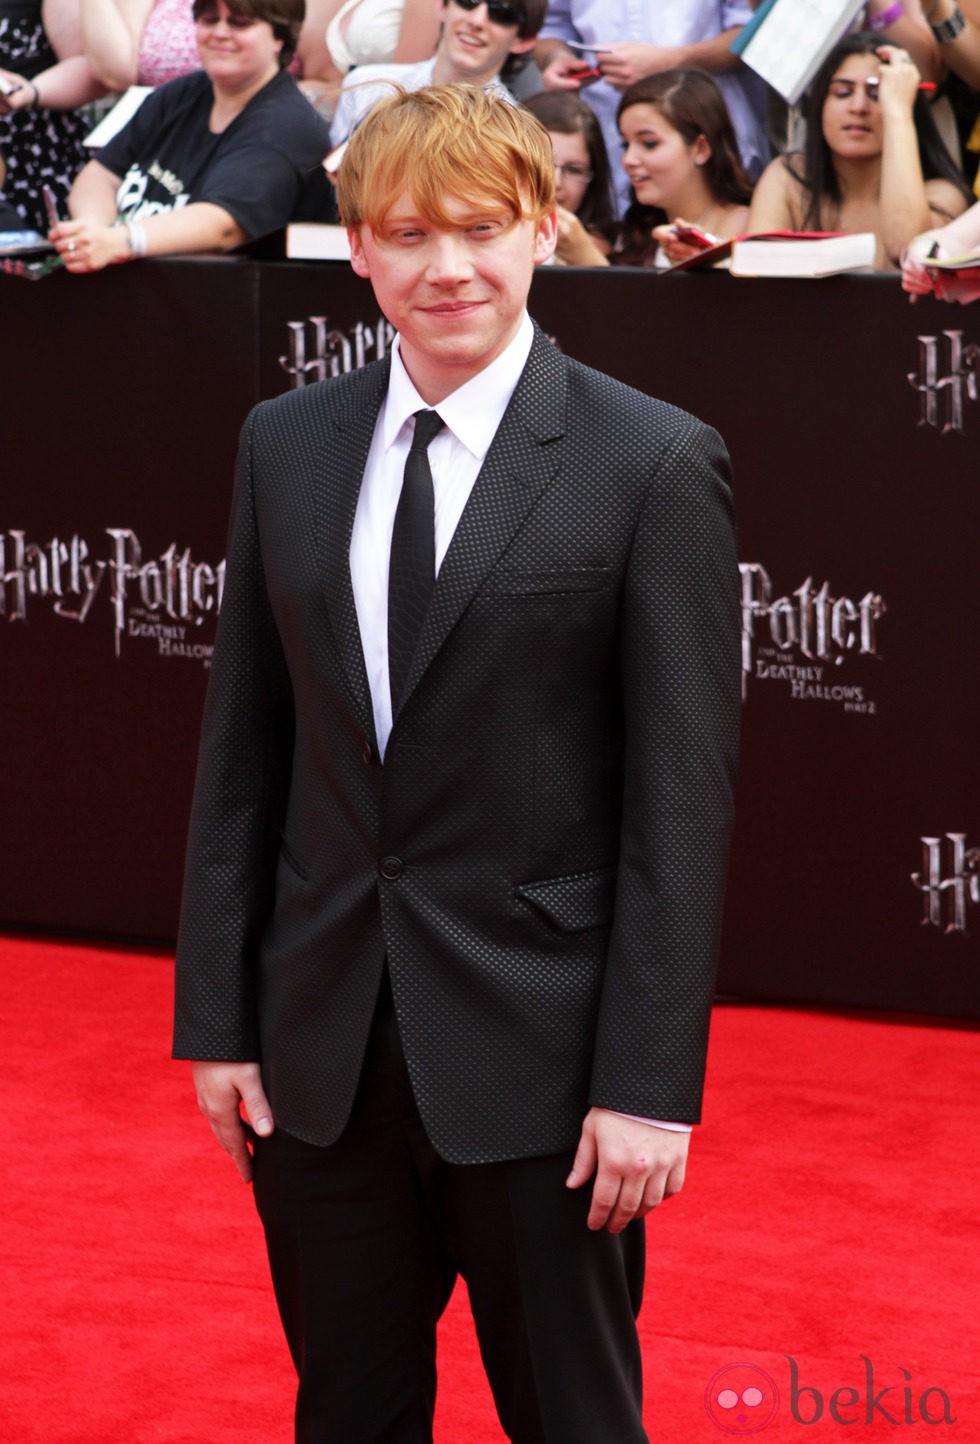 Rupert Grint en la premiére neoyorkina de 'Harry Potter y las reliquias de la muerte: Parte 2'